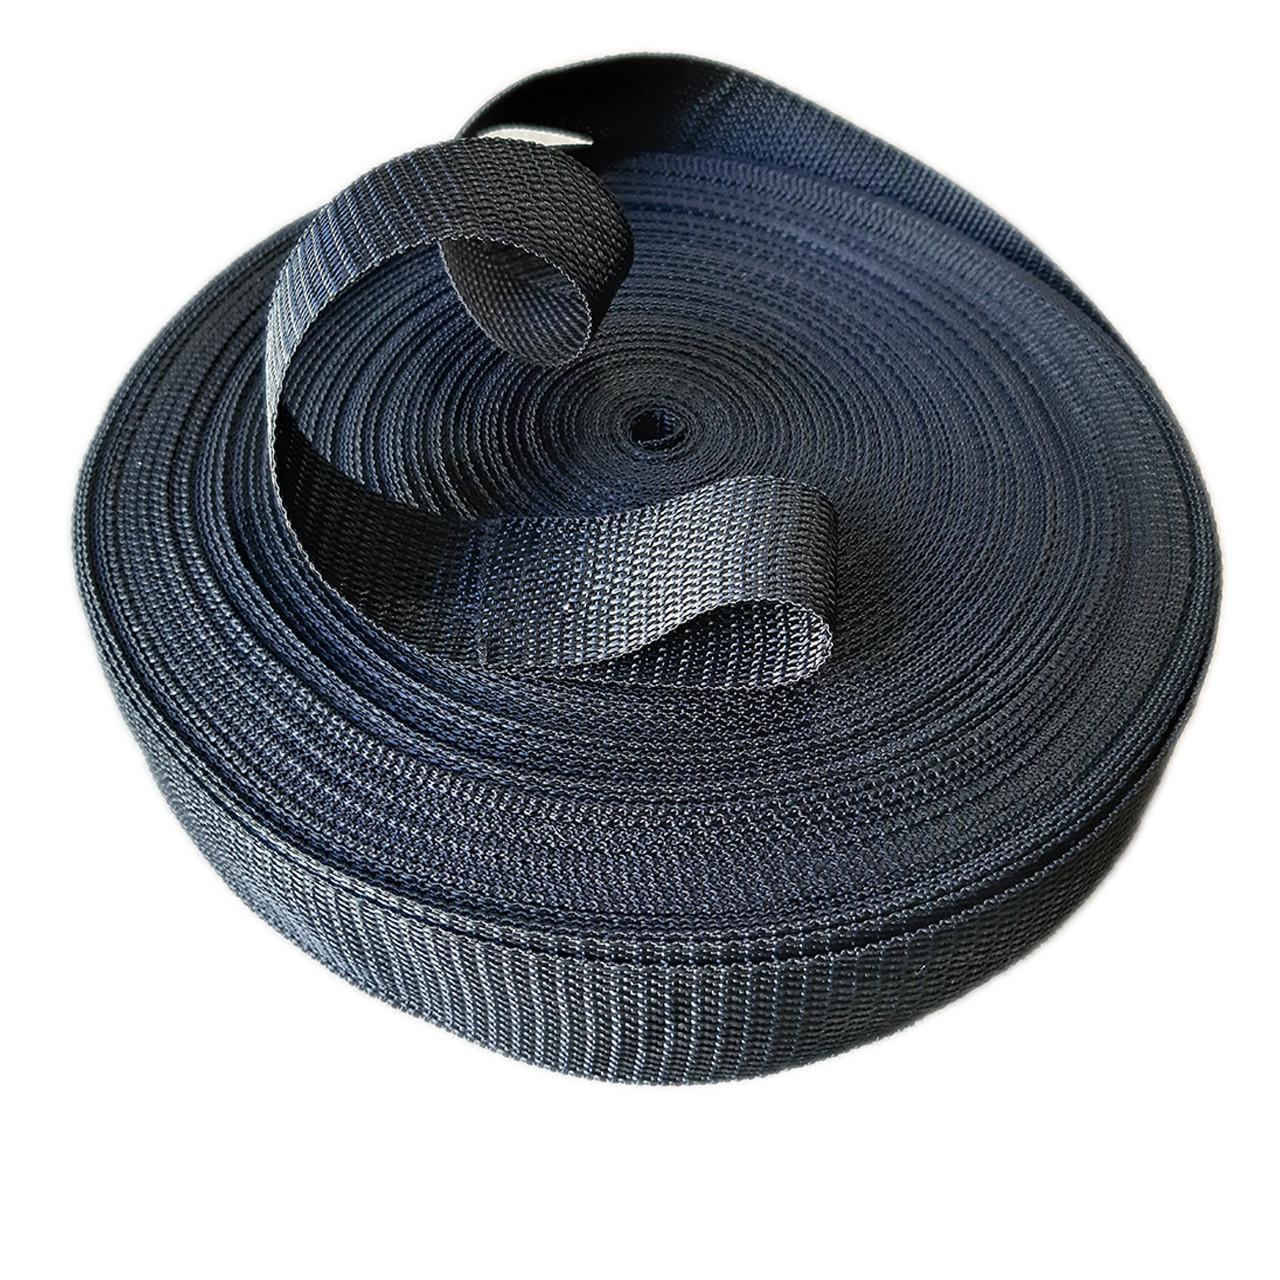 Стрічка сумочная рюкзачна 25 мм 50 м стропа ремінна поліпропіленова (синтетична)